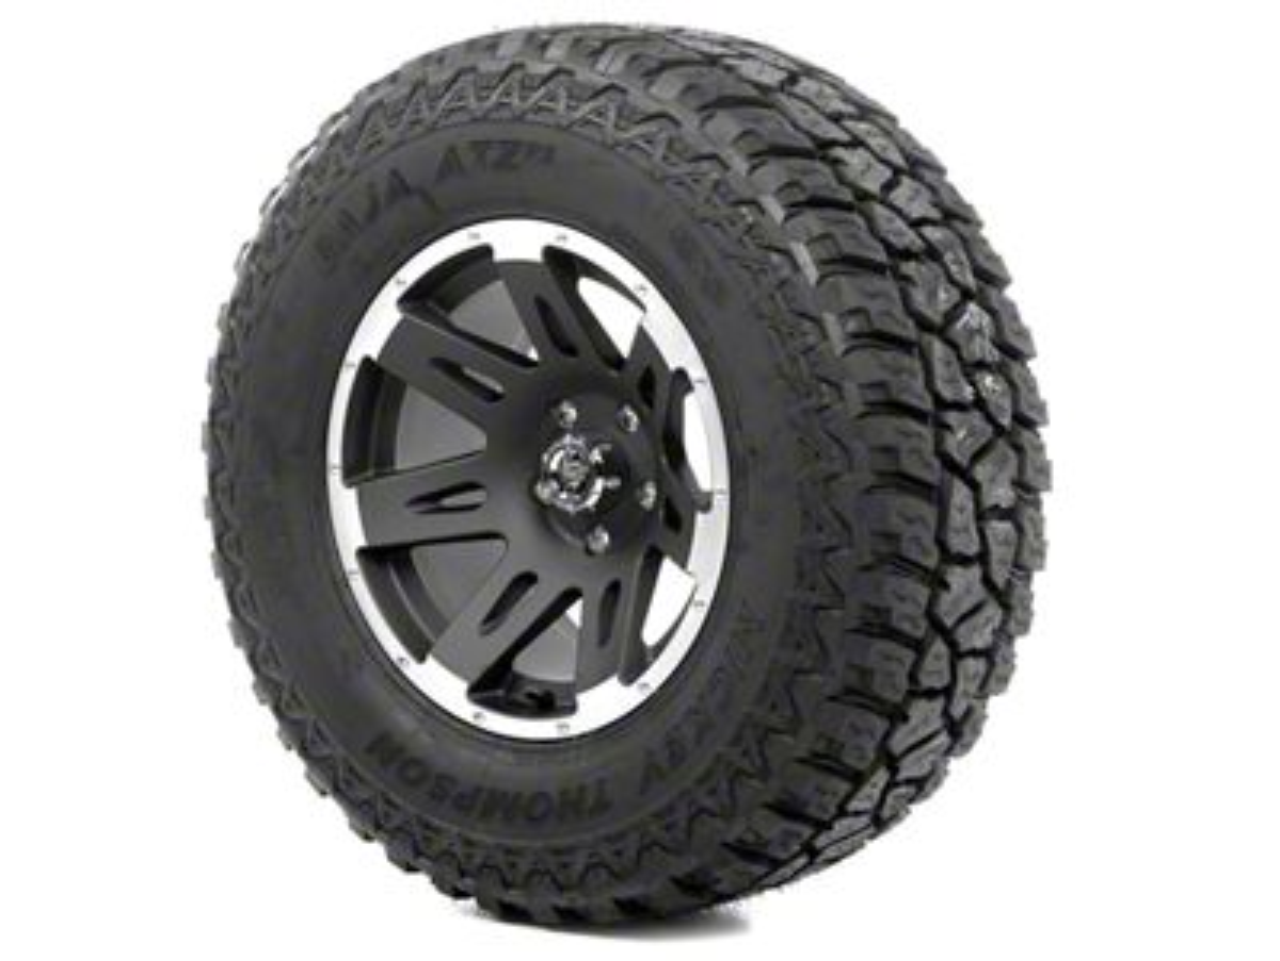 Rugged Ridge XHD Wheel 17x9 Black Satin w/Machined Lip and Mickey Thompson ATZ P3 305/65R17 Tire Kit (13-18 Jeep Wrangler JK; 2018 Jeep Wrangler JL)